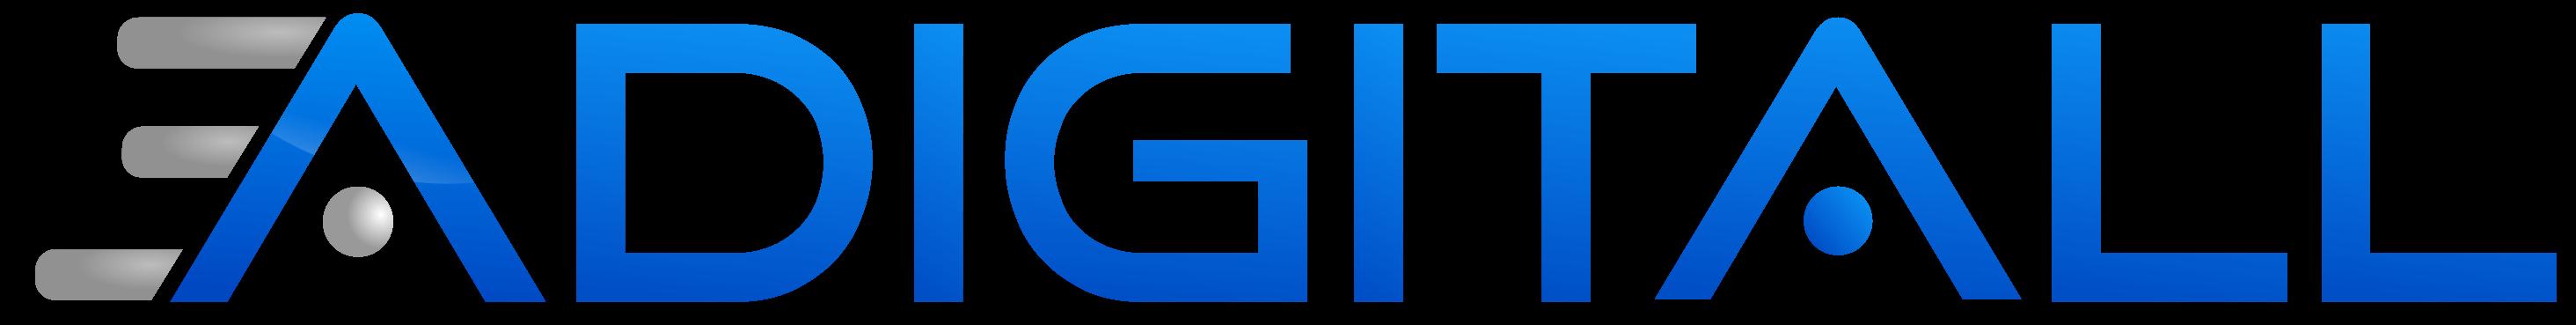 logotipo-3A Digitall